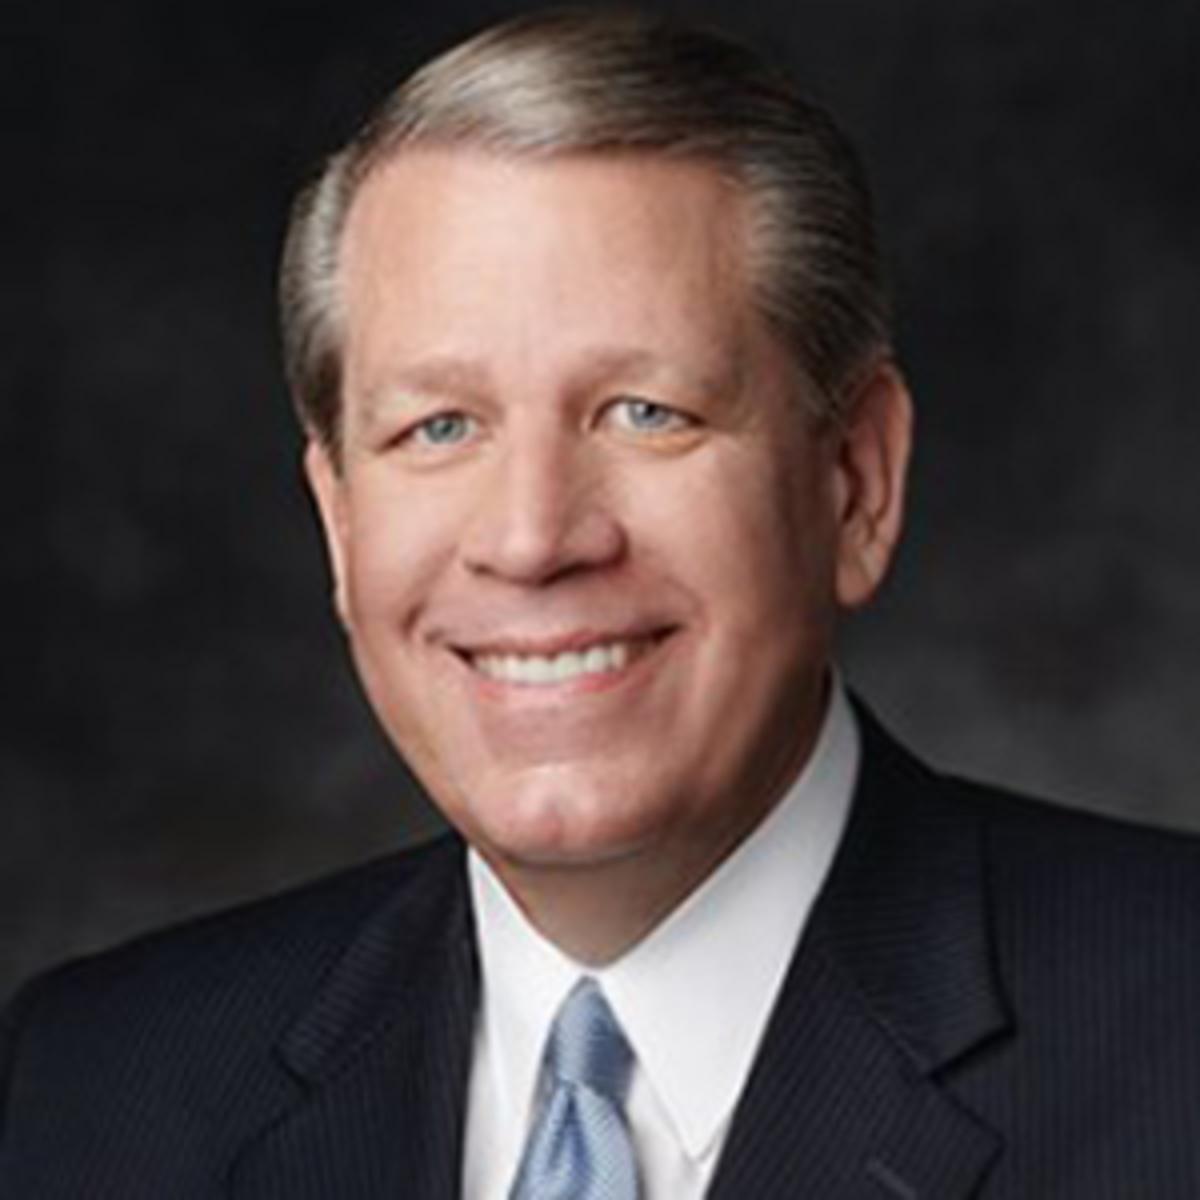 Elder Donald Hallstrom